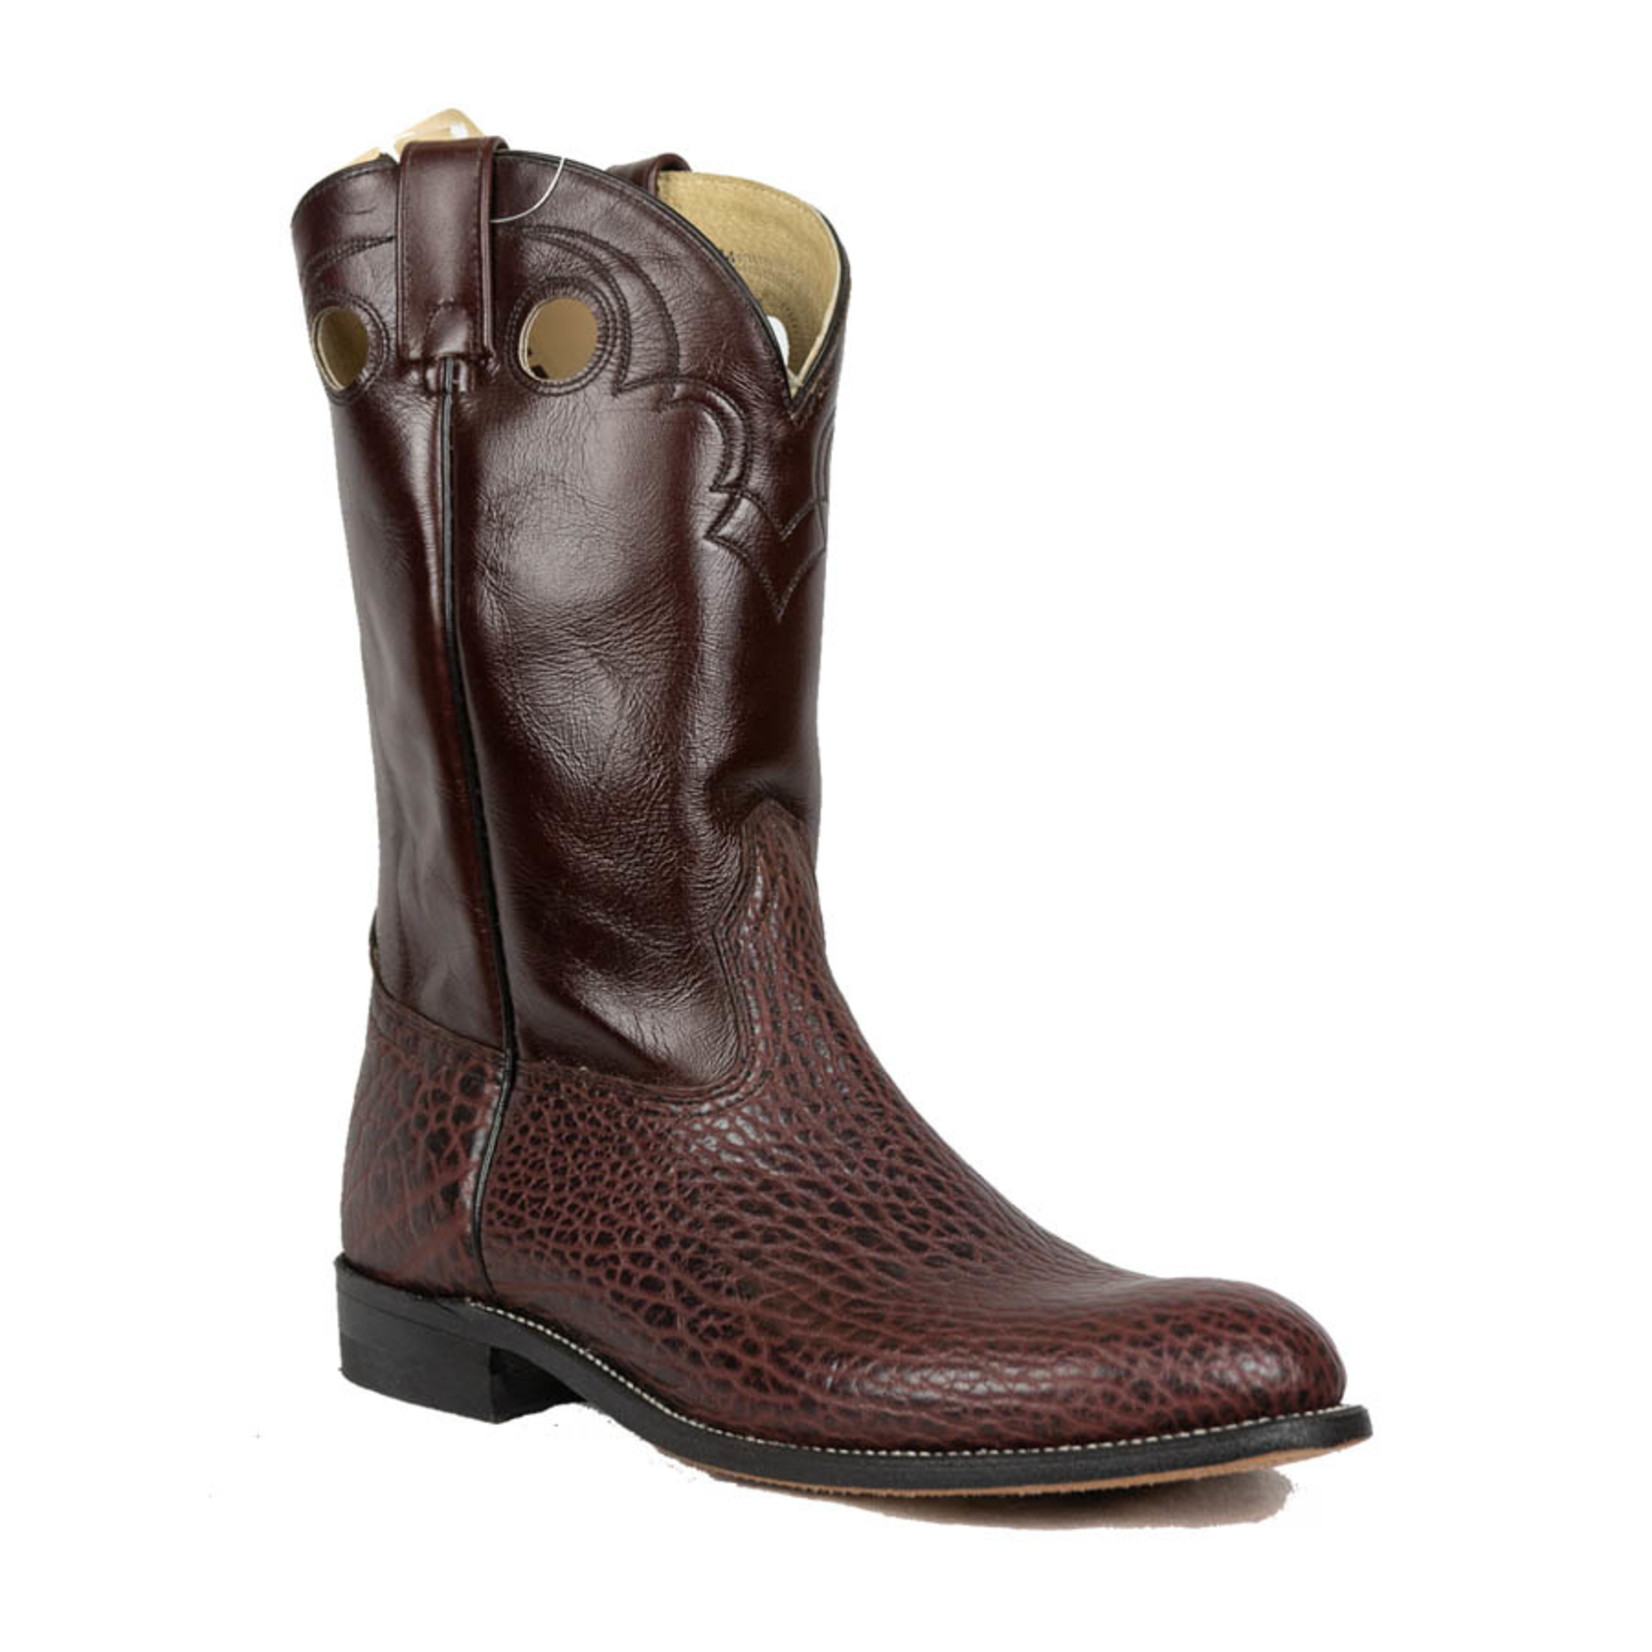 Brahma Brahma Men's Cowboy Boot 8142 E